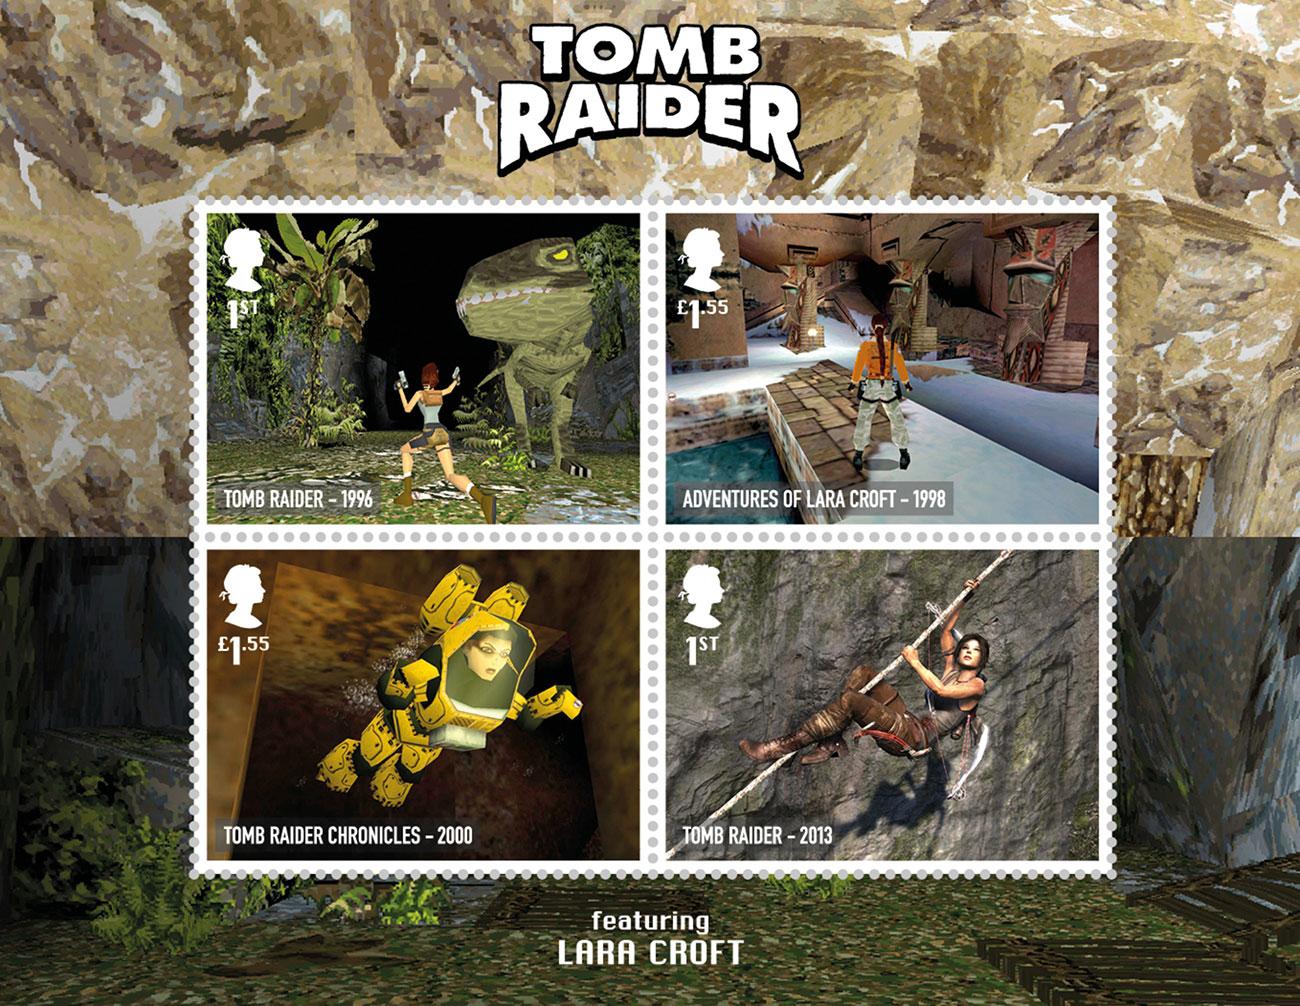 Royal Mail retro gaming stamps: Tomb Raider